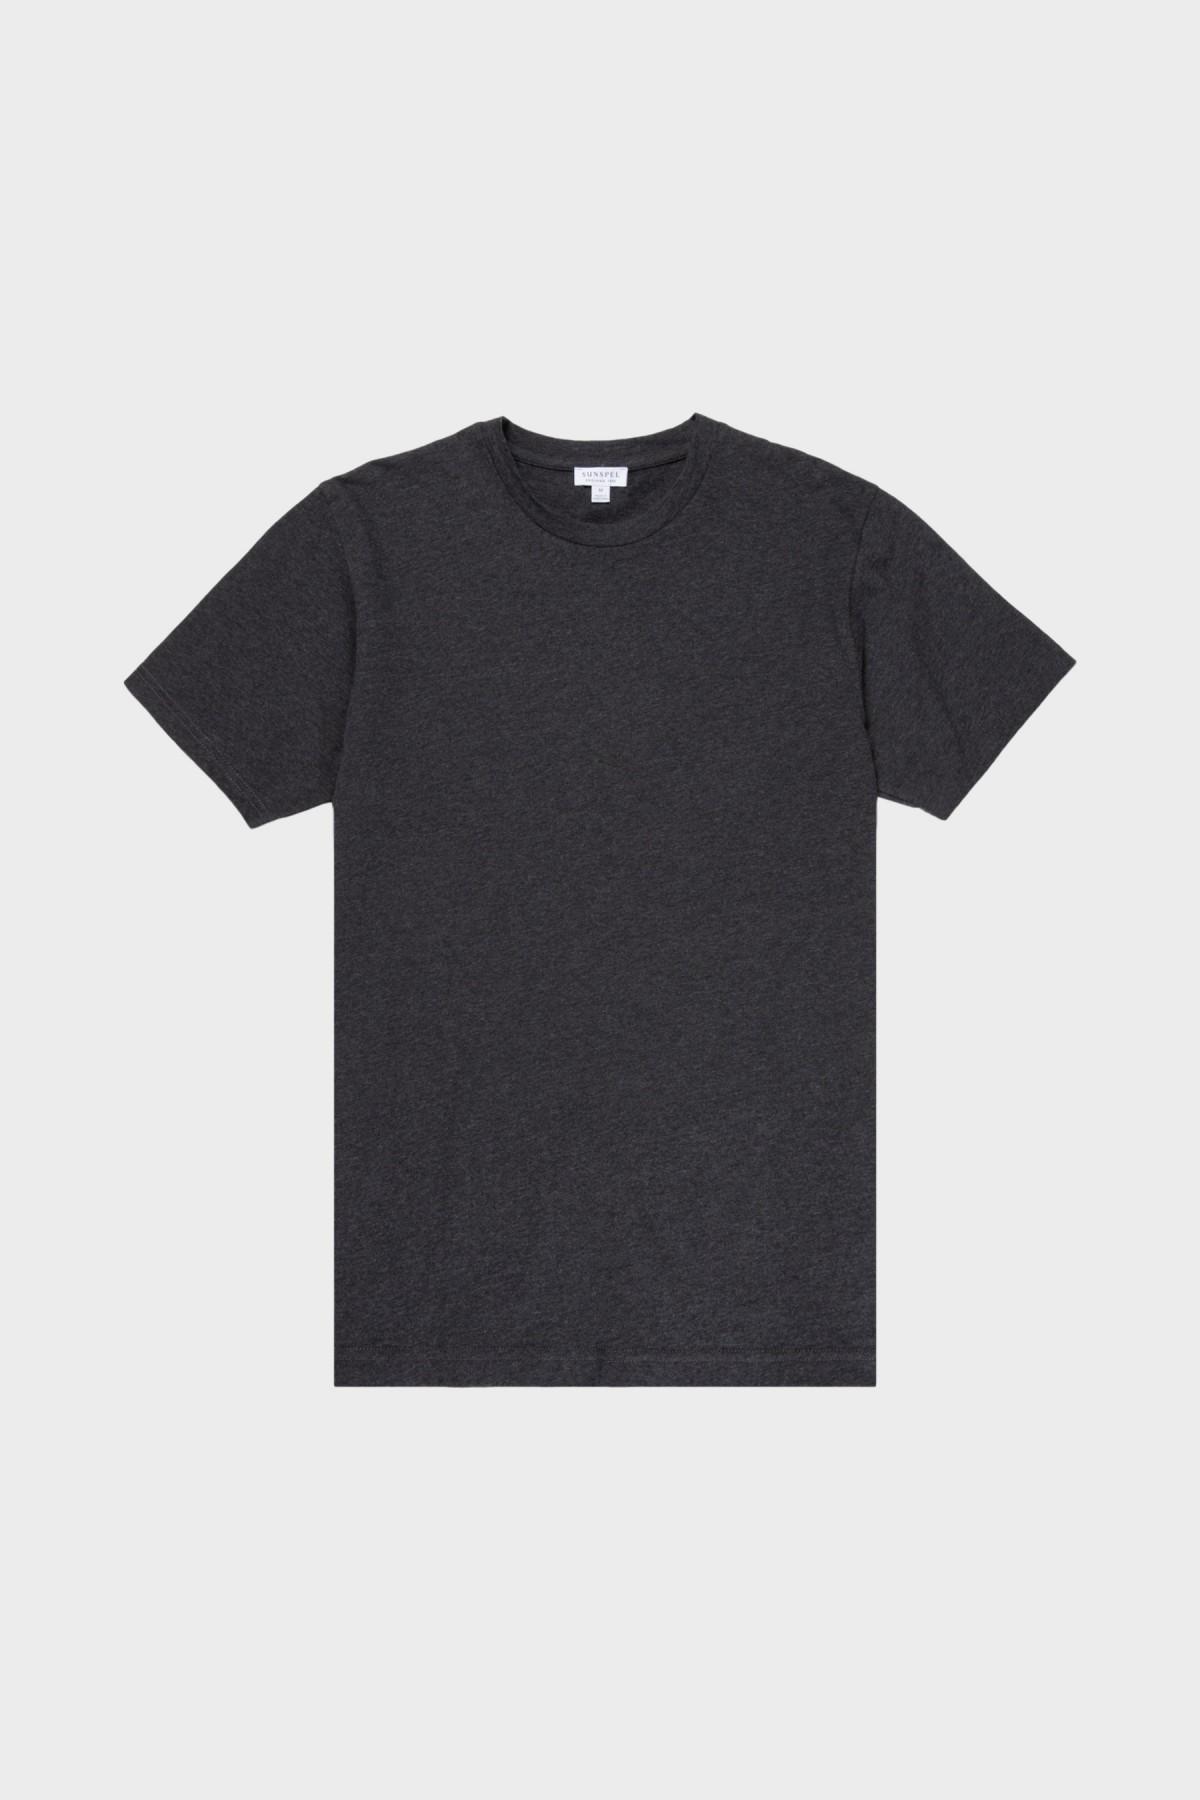 Sunspel Riviera Crew Neck T-Shirt in Charcoal Melange